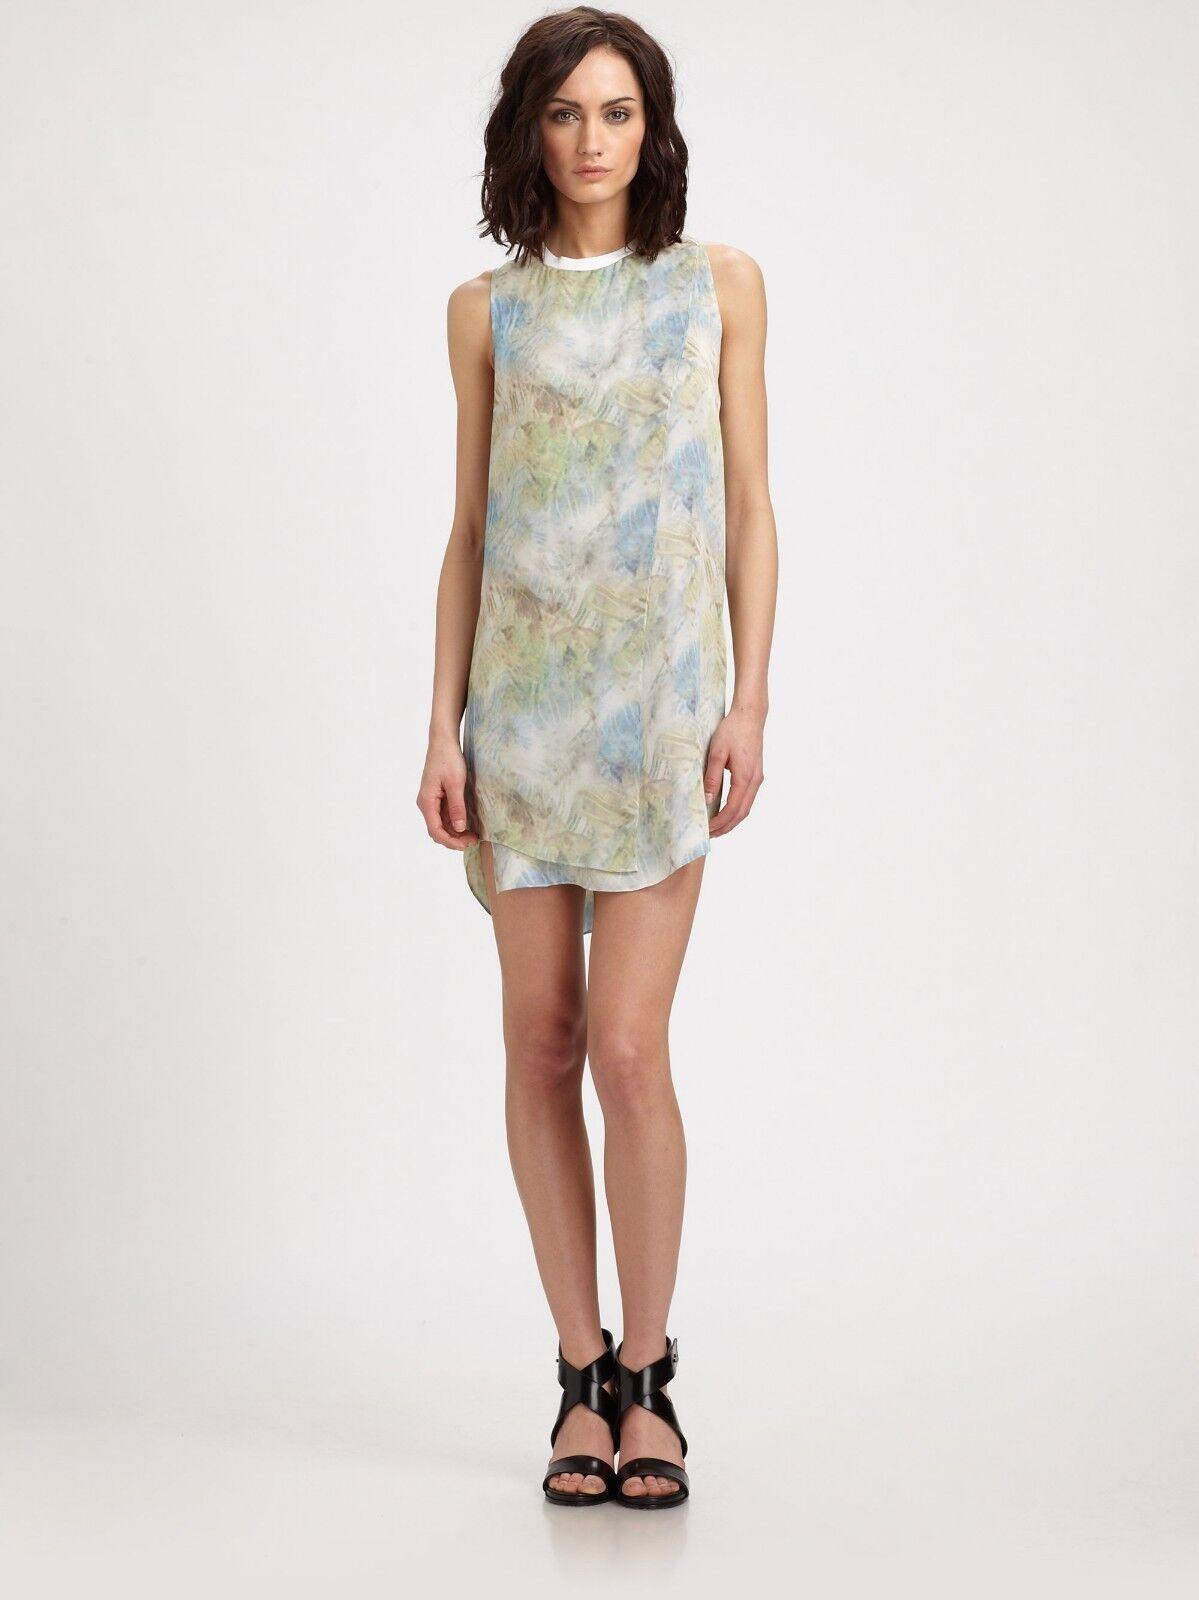 Theyskens' Theory Derious Itrey Sleeveless Silk Dress Mini Shift Grün Blau S 4